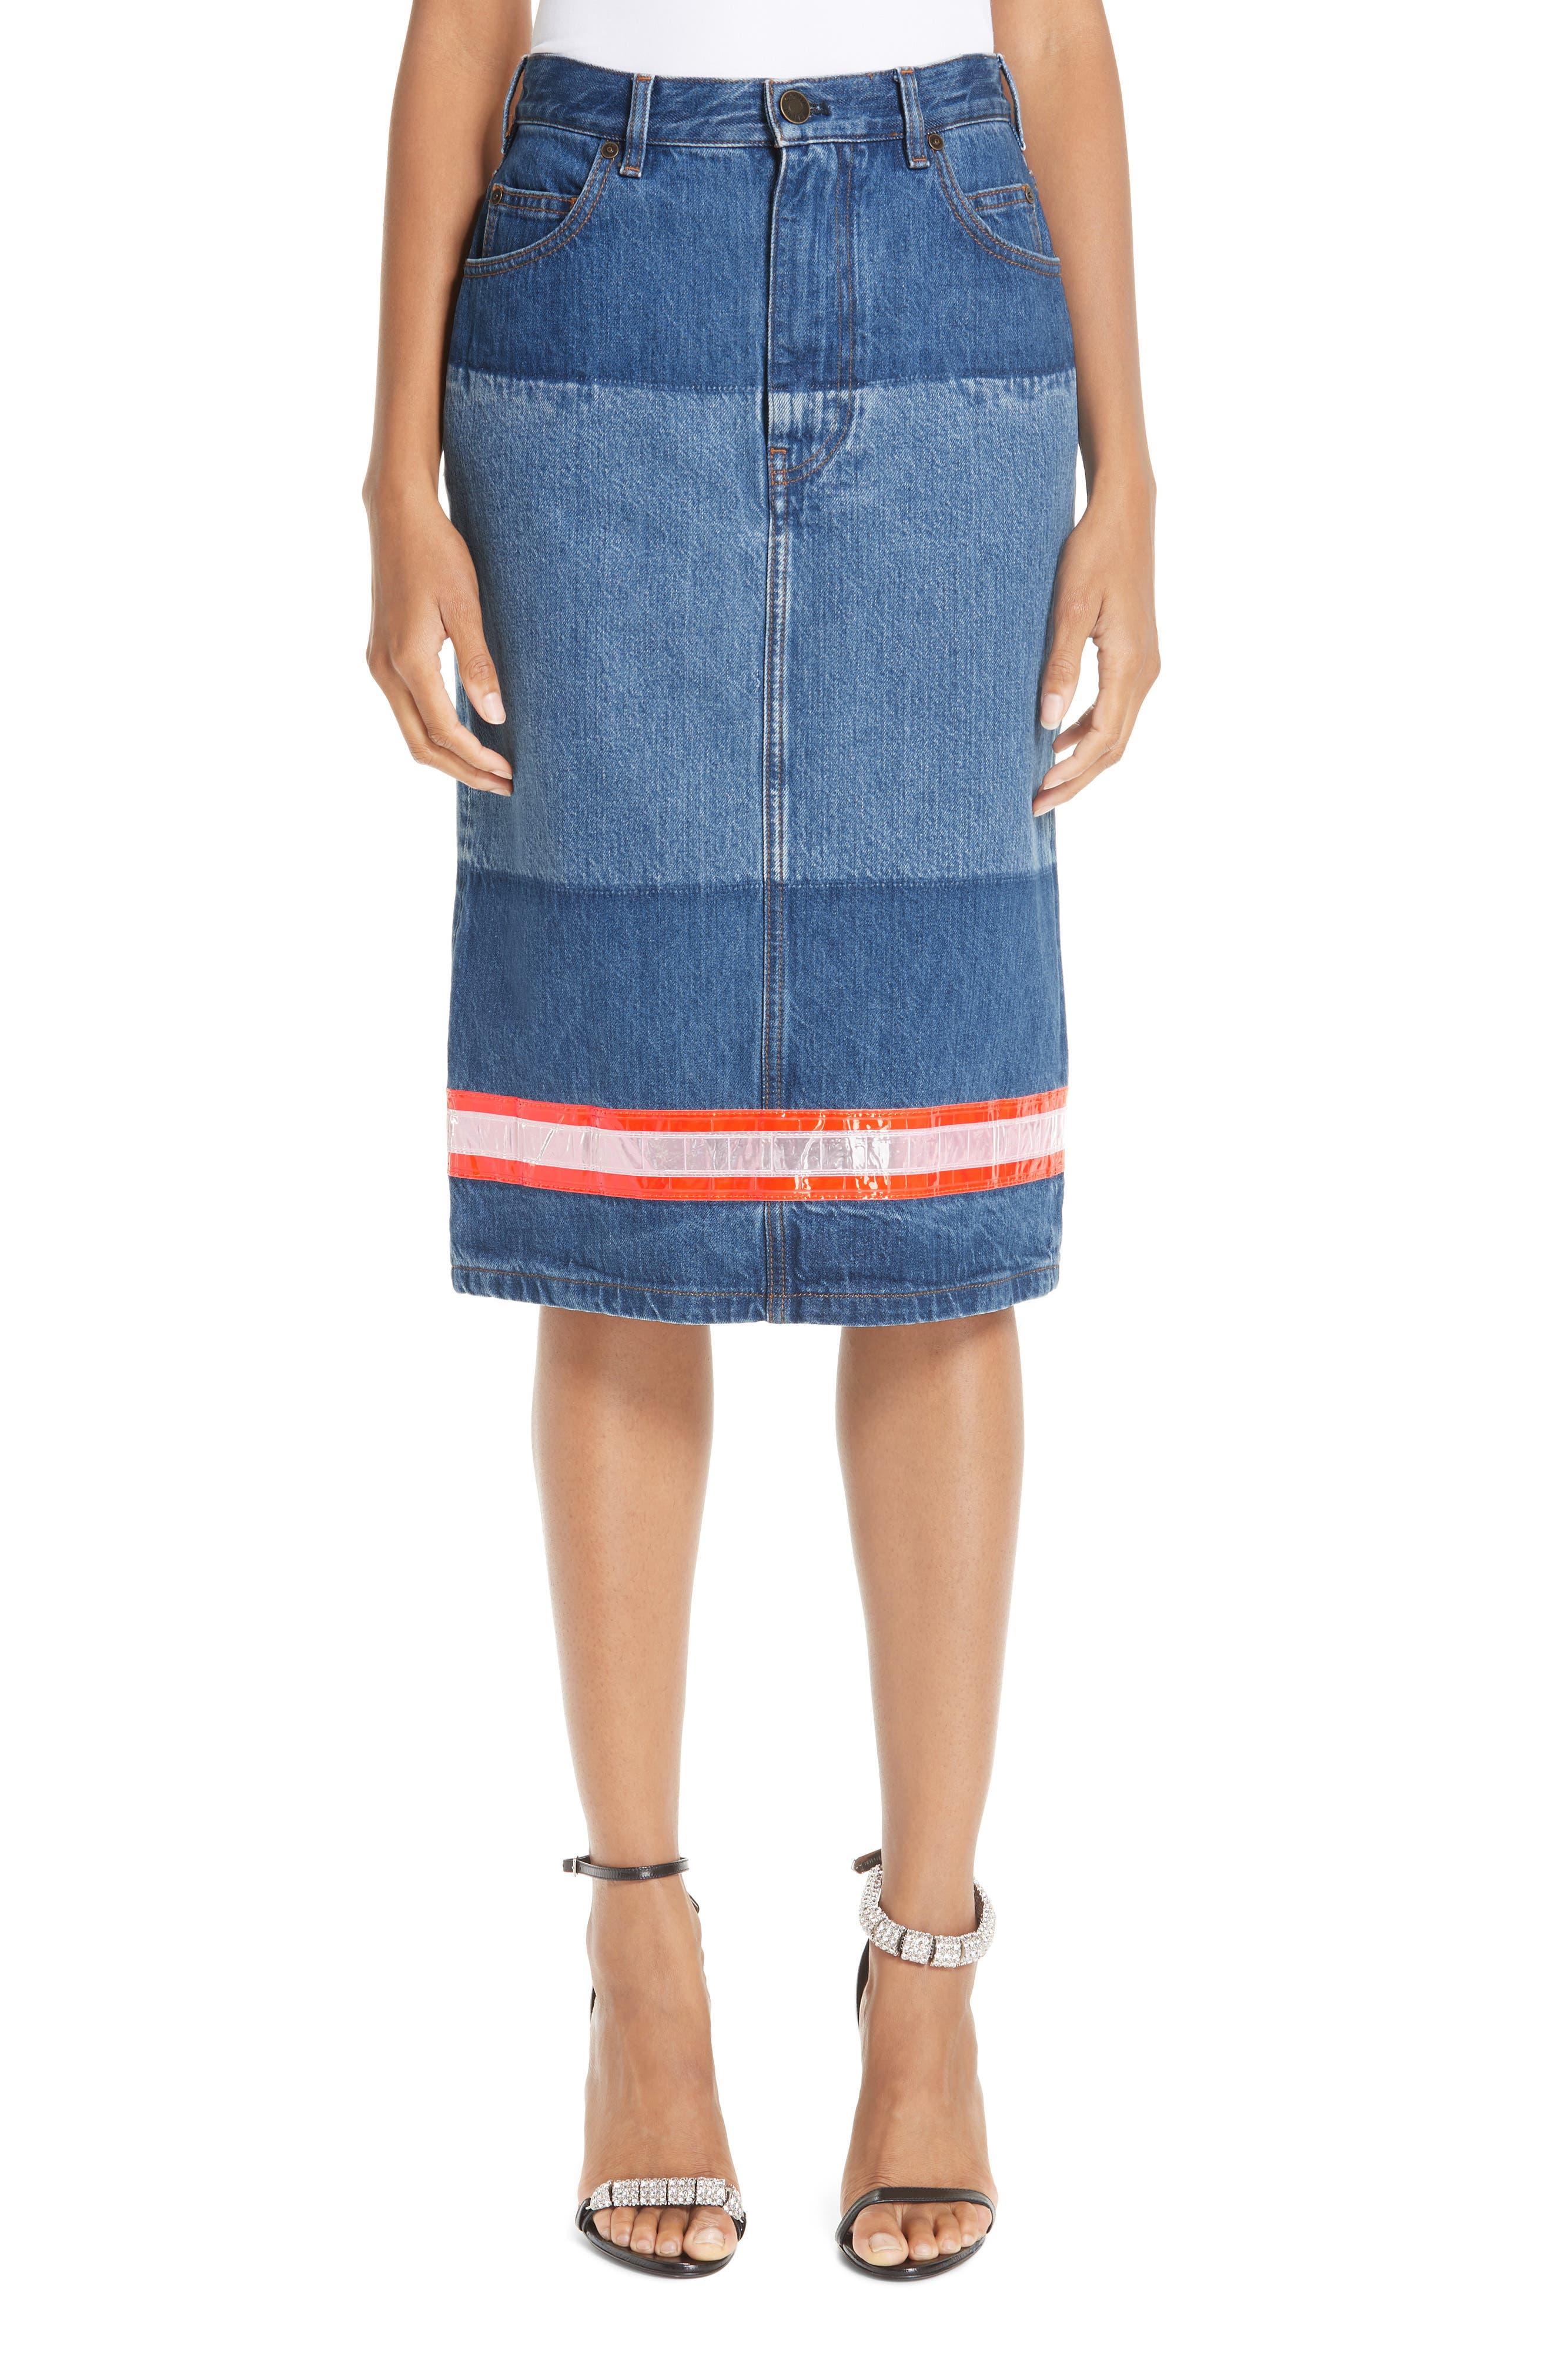 CALVIN KLEIN 205W39NYC,                             Reflective Stripe Mixed Wash Denim Skirt,                             Main thumbnail 1, color,                             BLUE